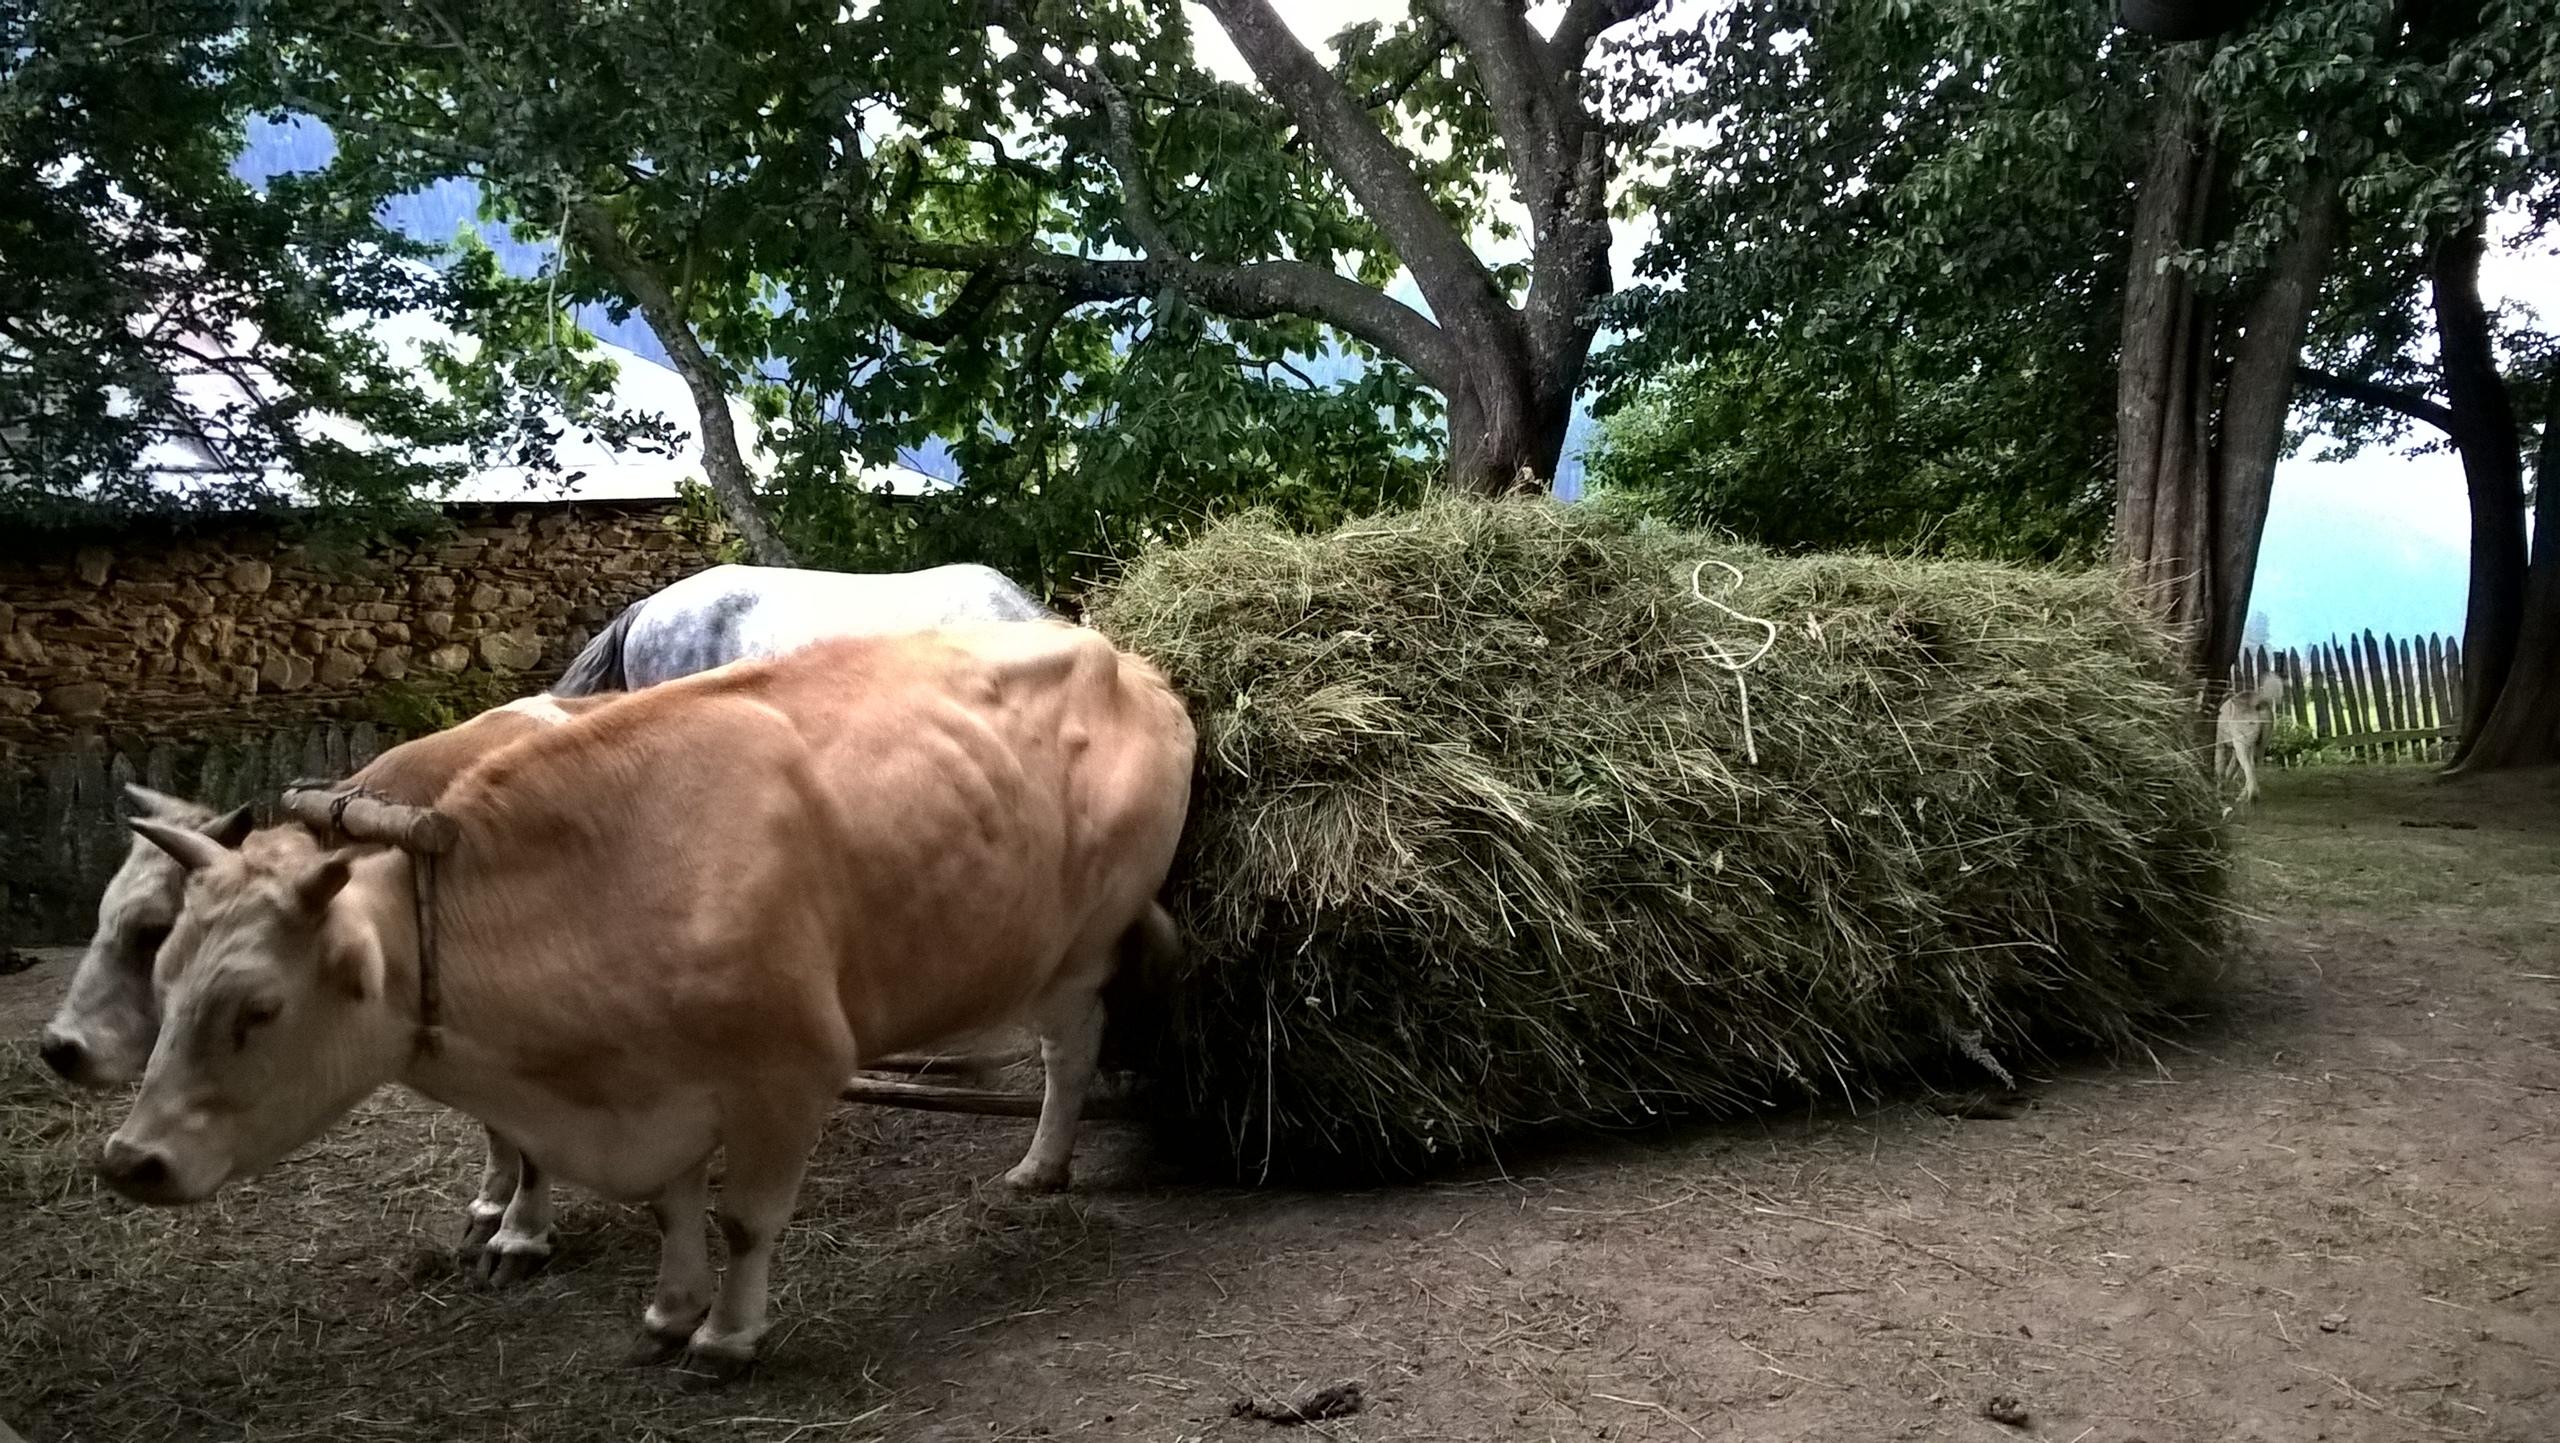 быки мускулистые Сырую траву